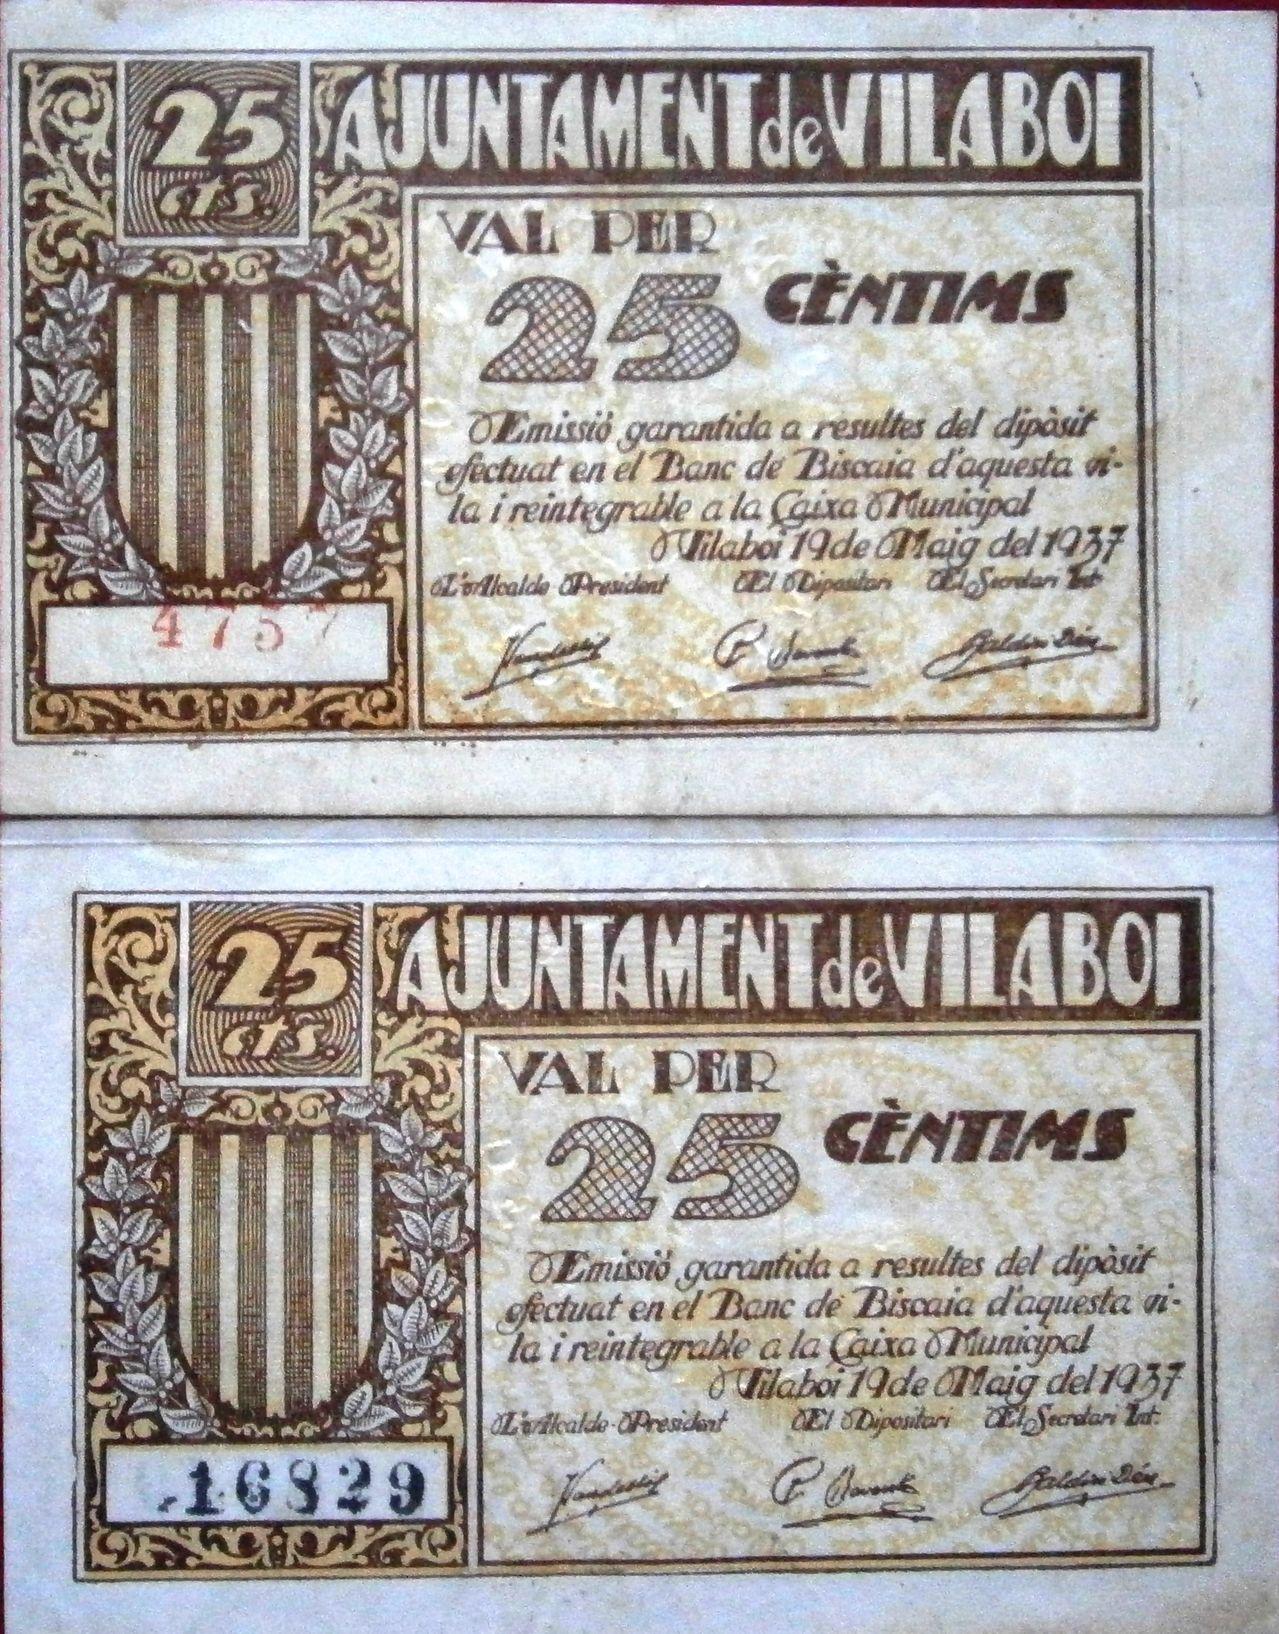 Vilaboi Sant Boi de LLobregat 25 Centimos 1937 Guerra Civil  P1010019